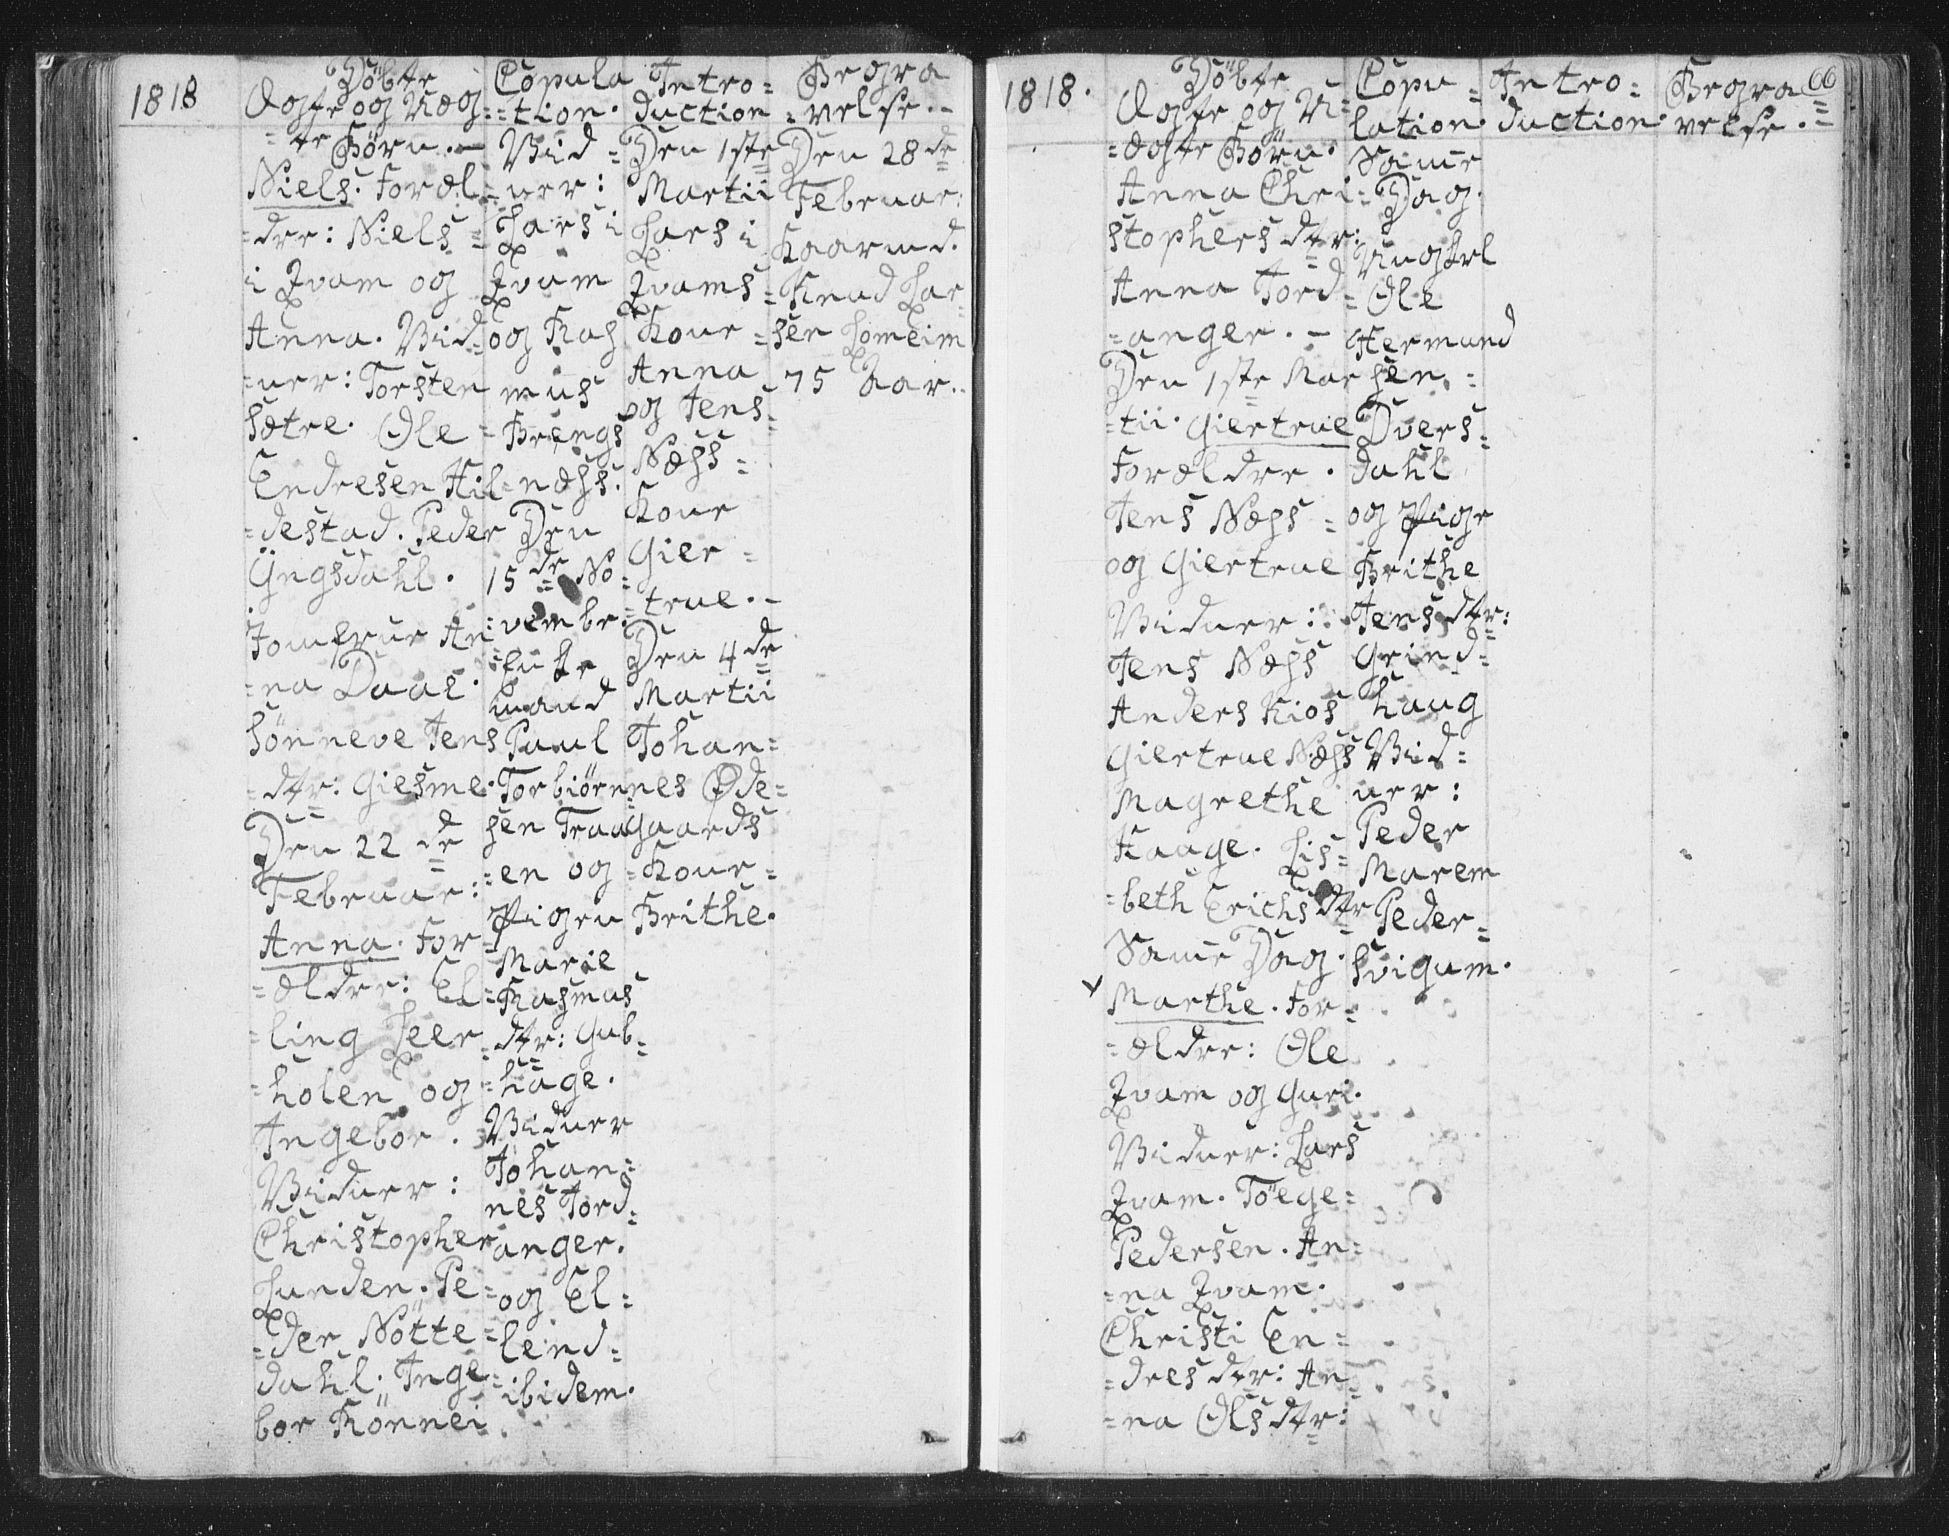 SAB, Hafslo sokneprestembete, H/Haa/Haaa/L0003: Ministerialbok nr. A 3, 1807-1821, s. 66